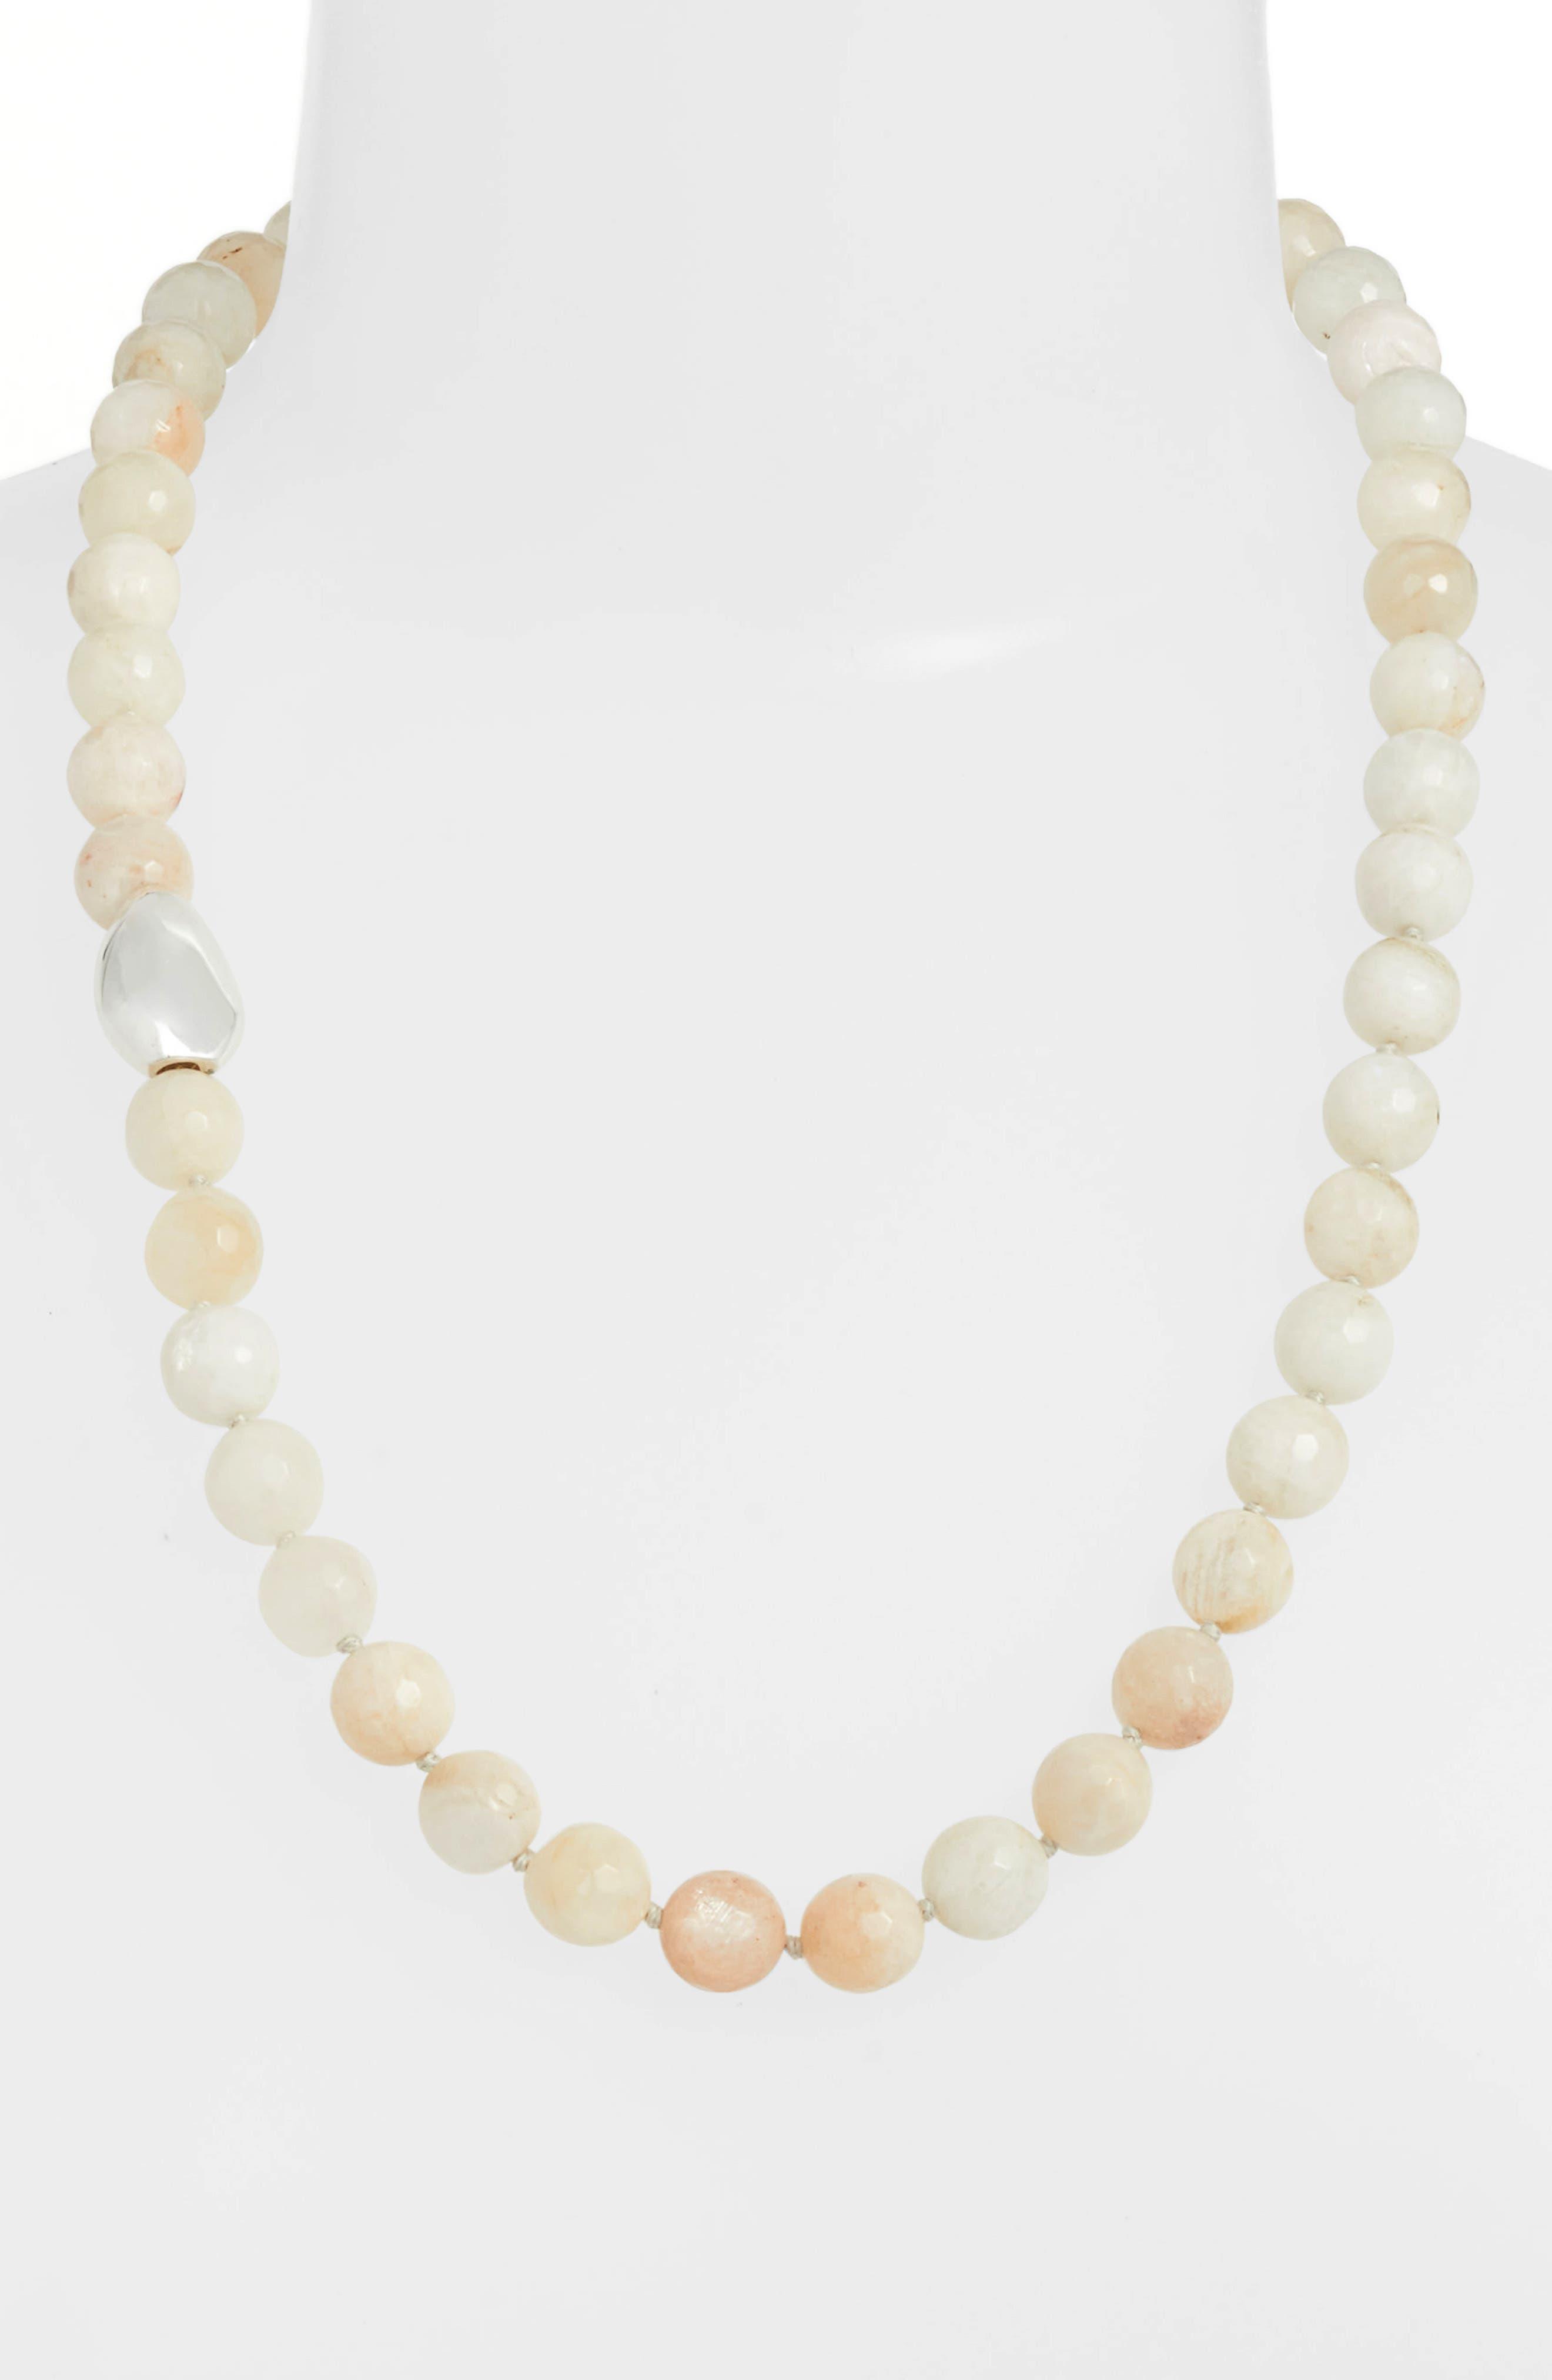 Simon Sebbag White Moonstone Necklace